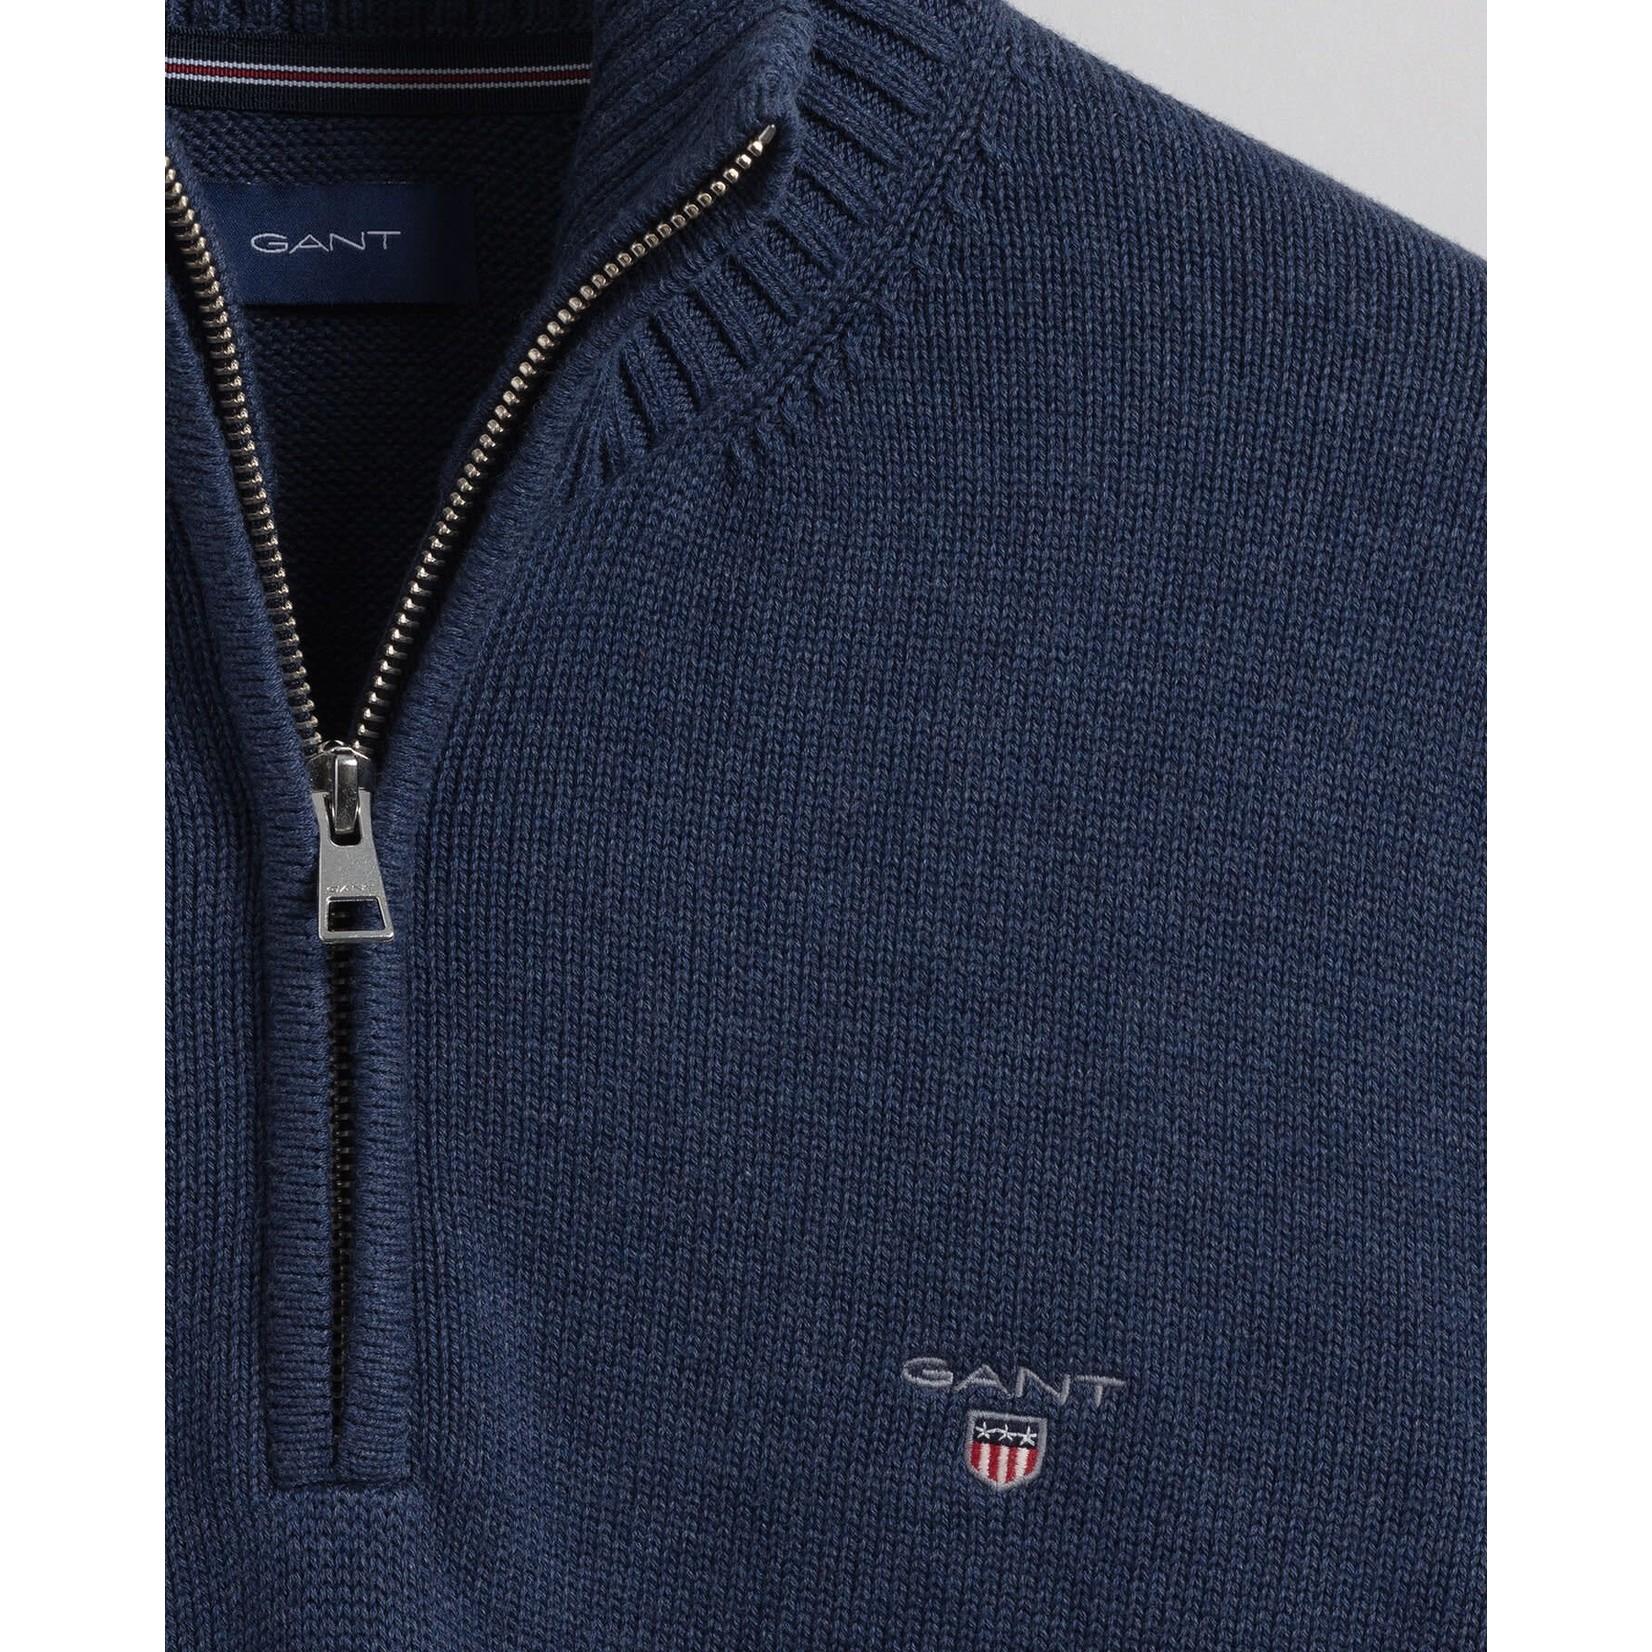 GANT katoenen trui met korte rits jeansblauw